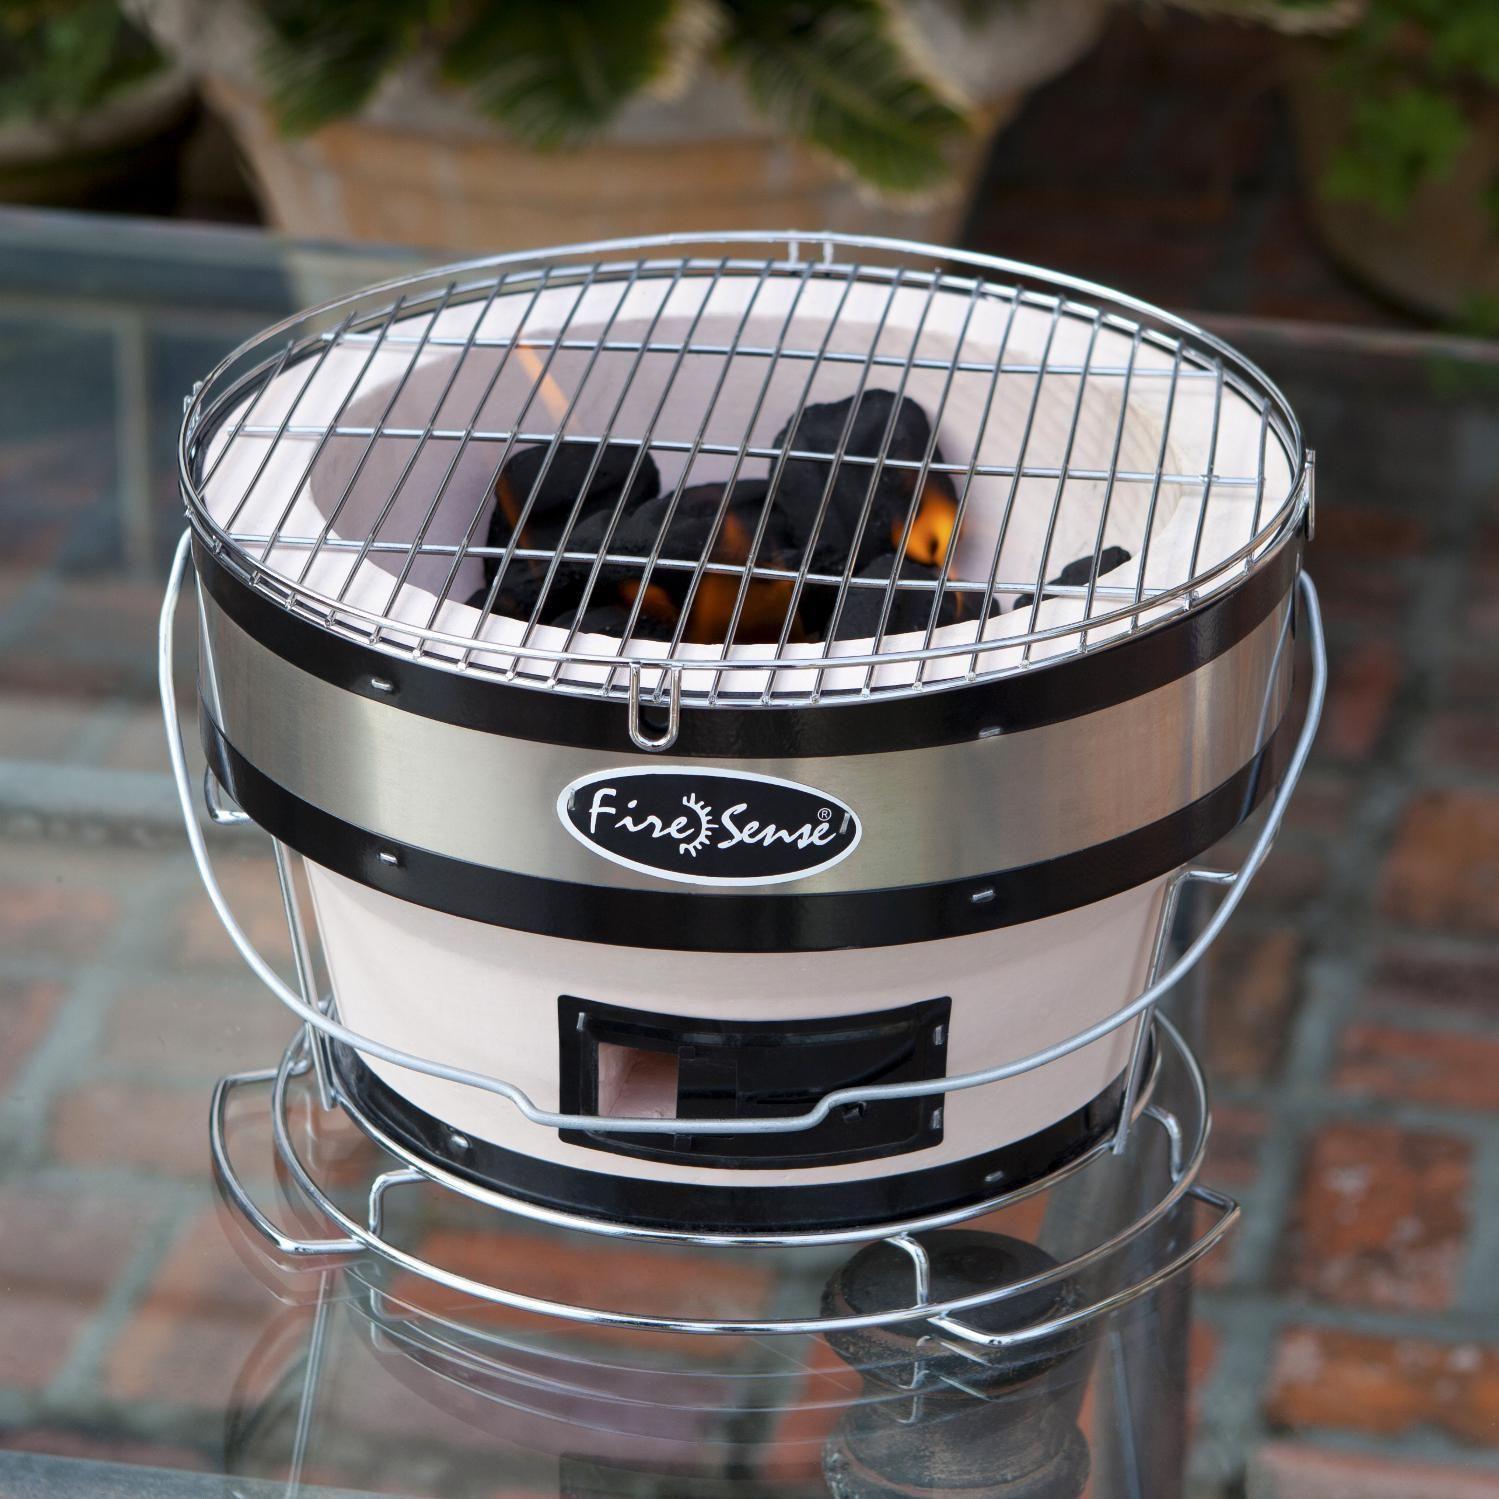 Fire Sense 11 Inch Small Yakatori Tabletop Charcoal Grill 60449